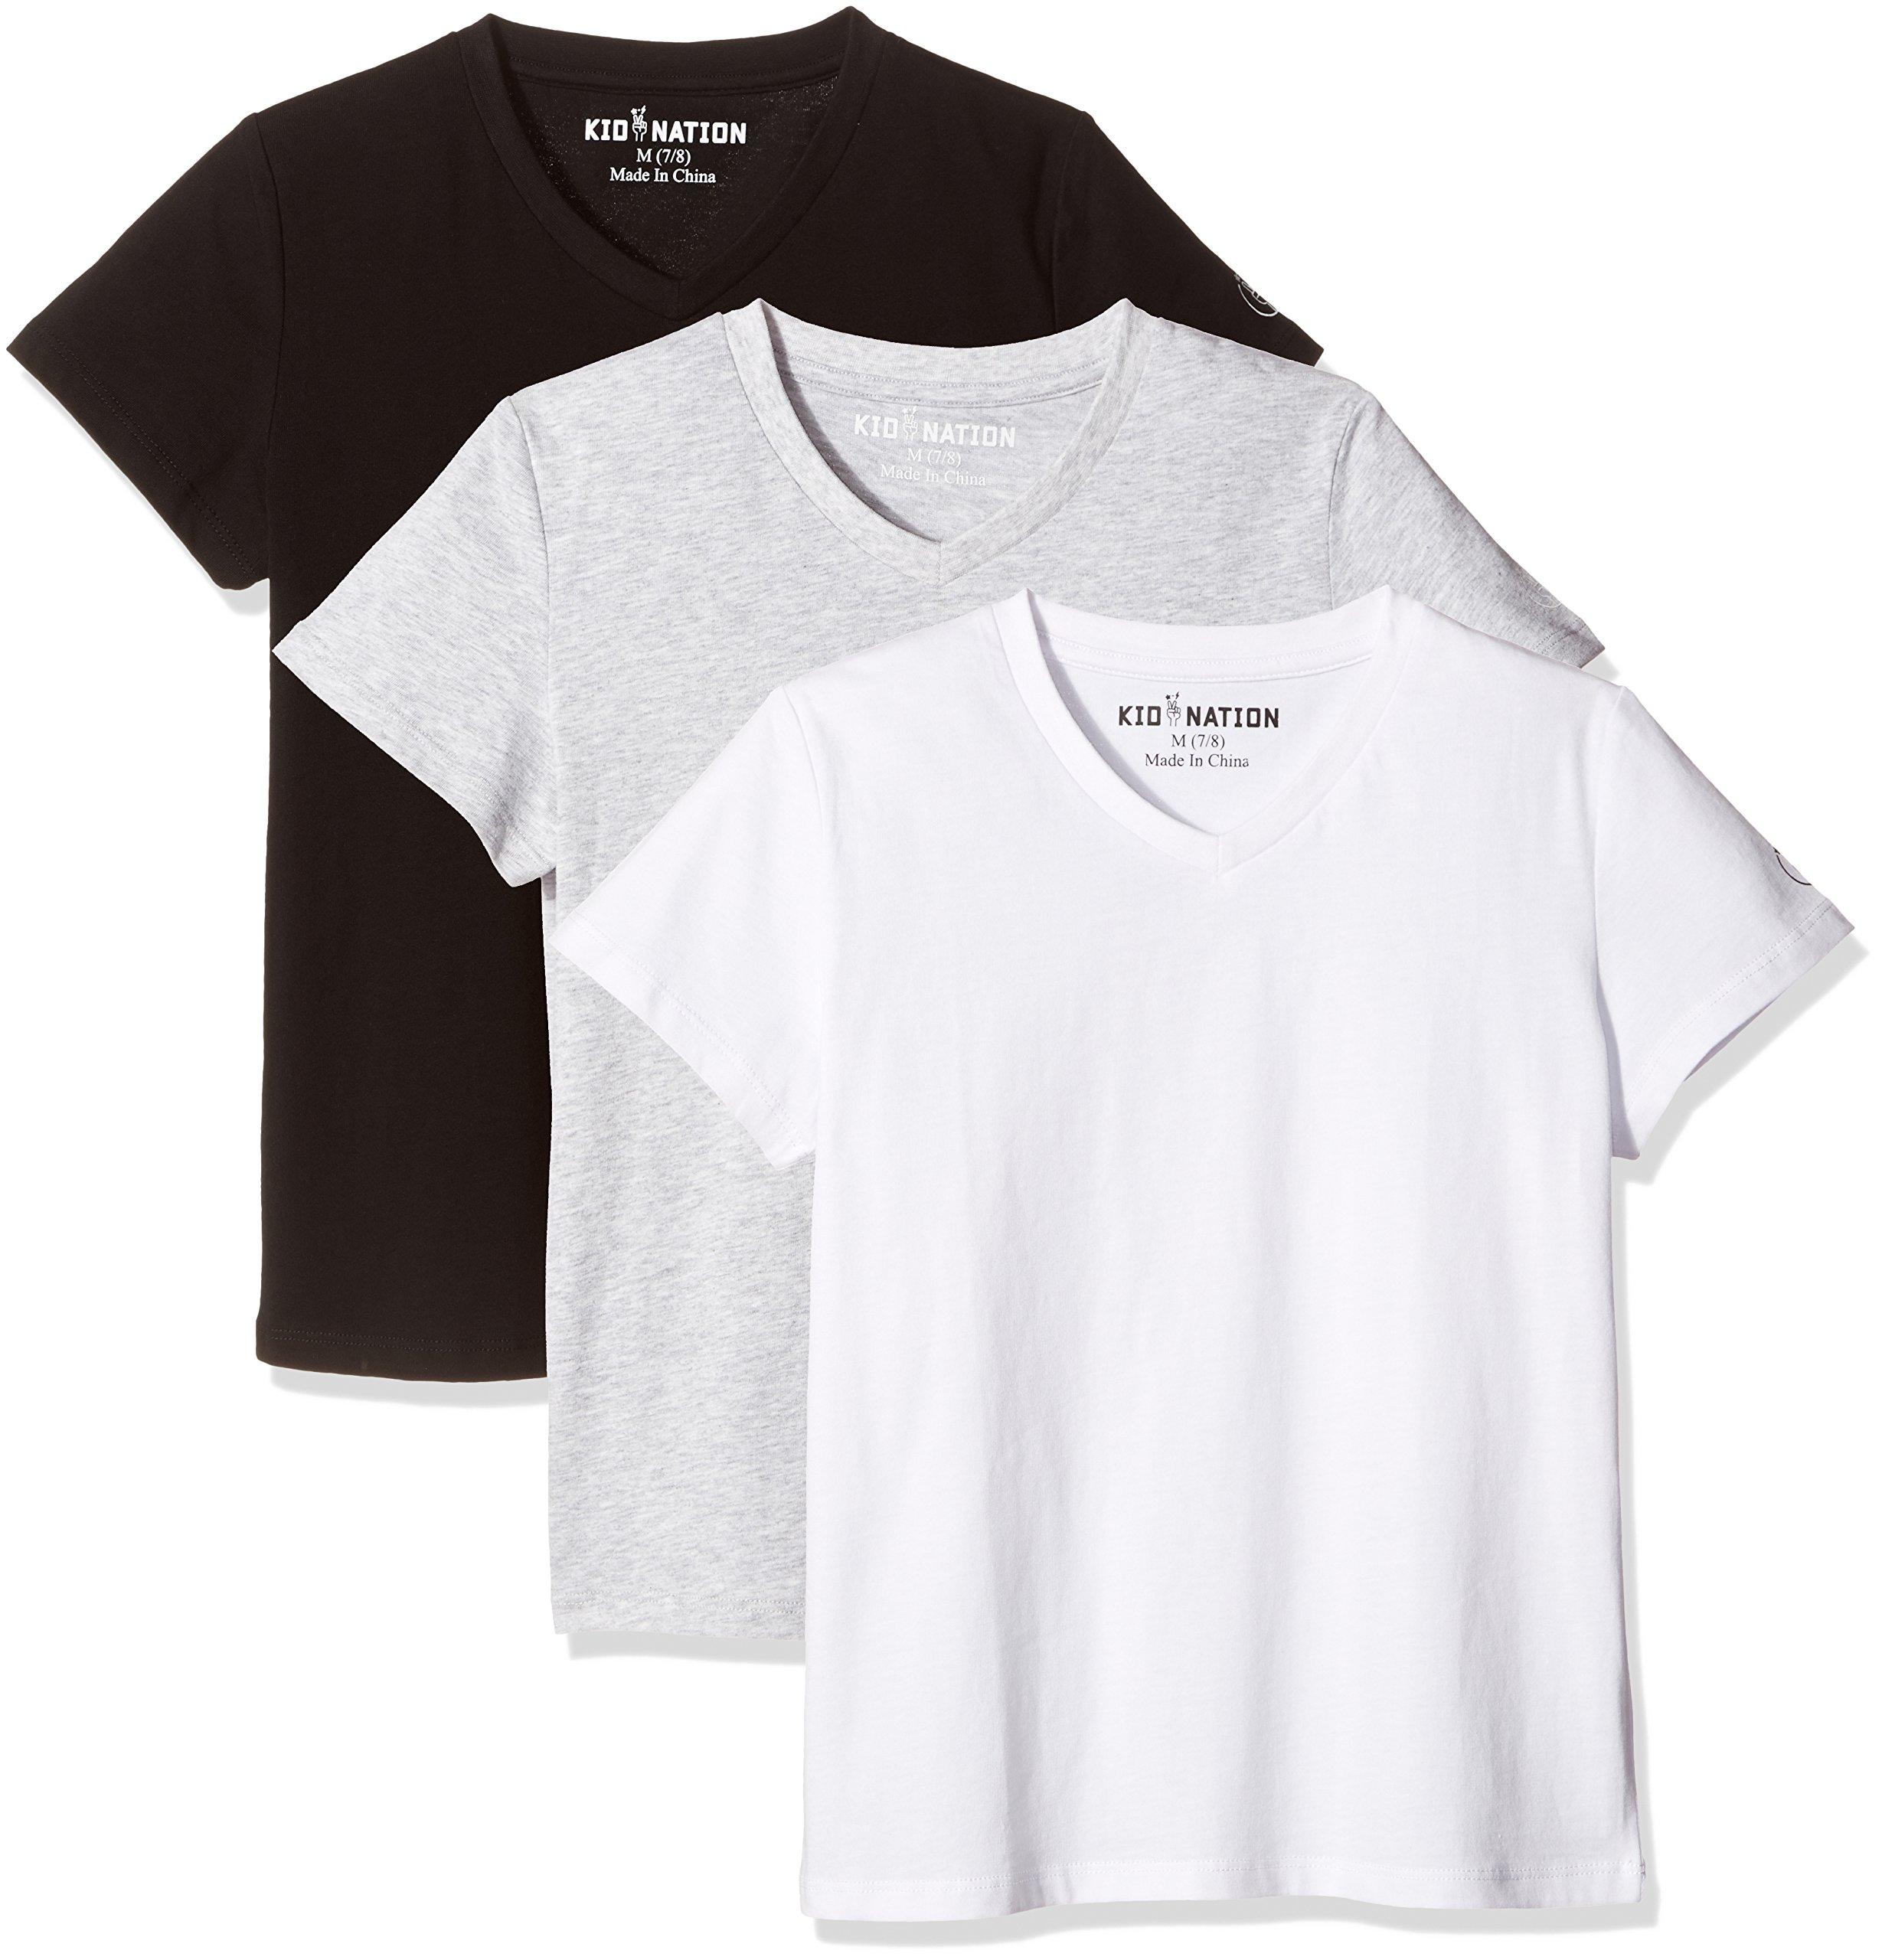 Kid Nation Kids' 3-Pack Short-Sleeve V-Neck Cotton Jersey T-Shirt for Boys Girls XL Black + White + Gray Heather